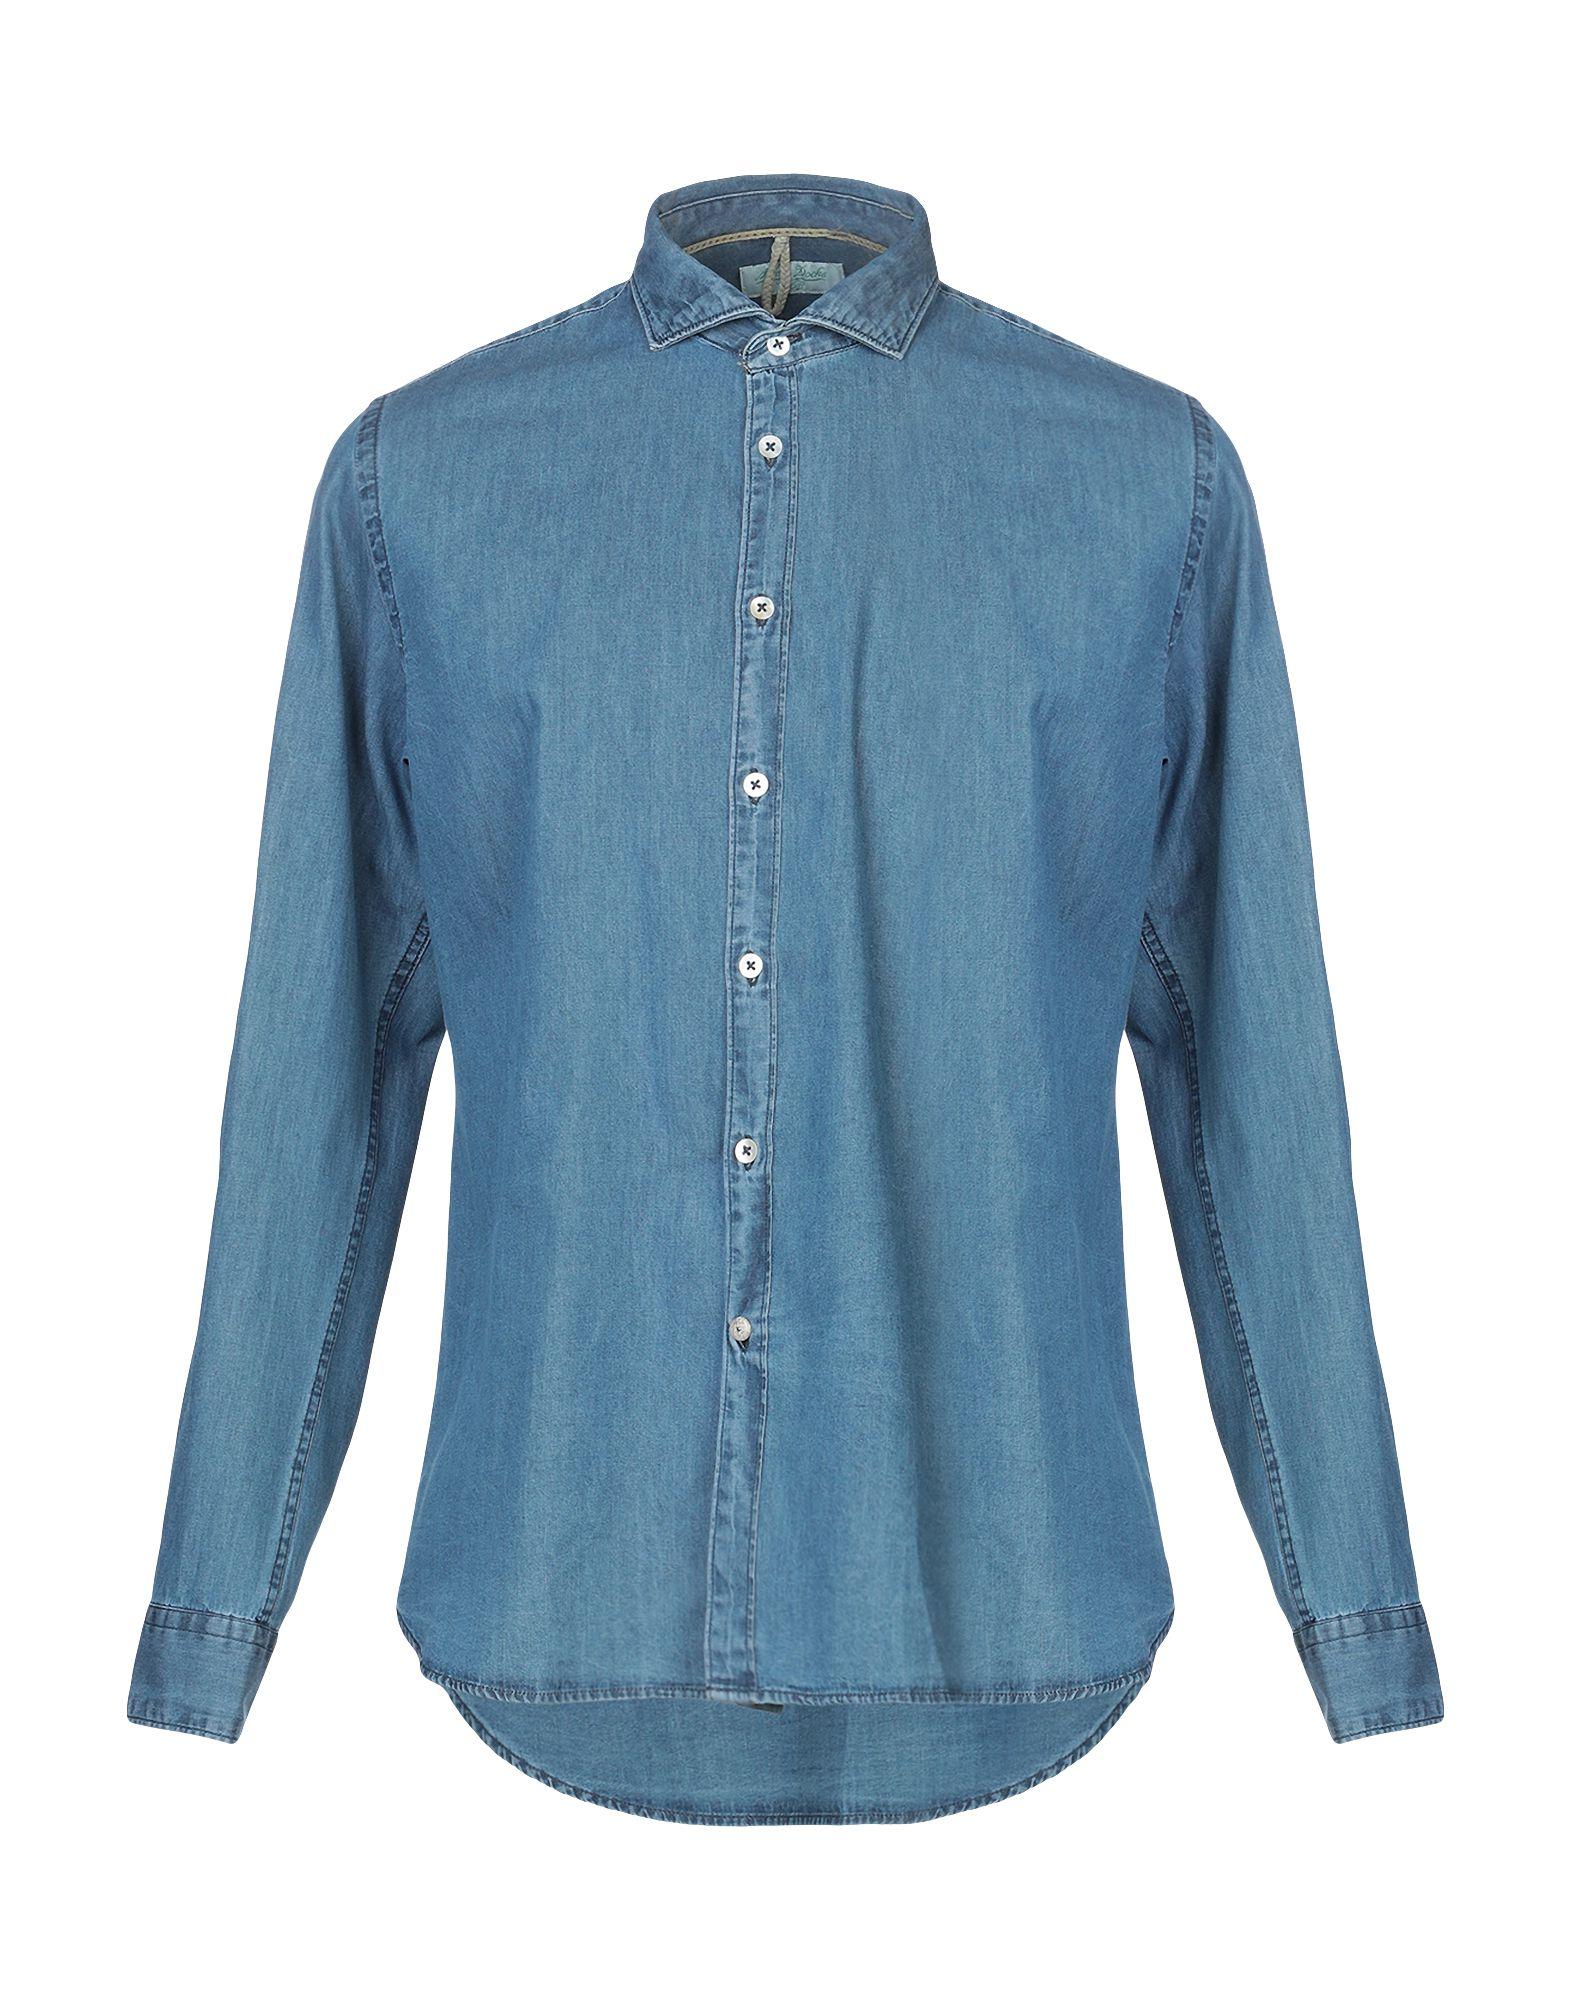 ALLEY DOCKS 963 Джинсовая рубашка alley docks 963 джинсовая рубашка